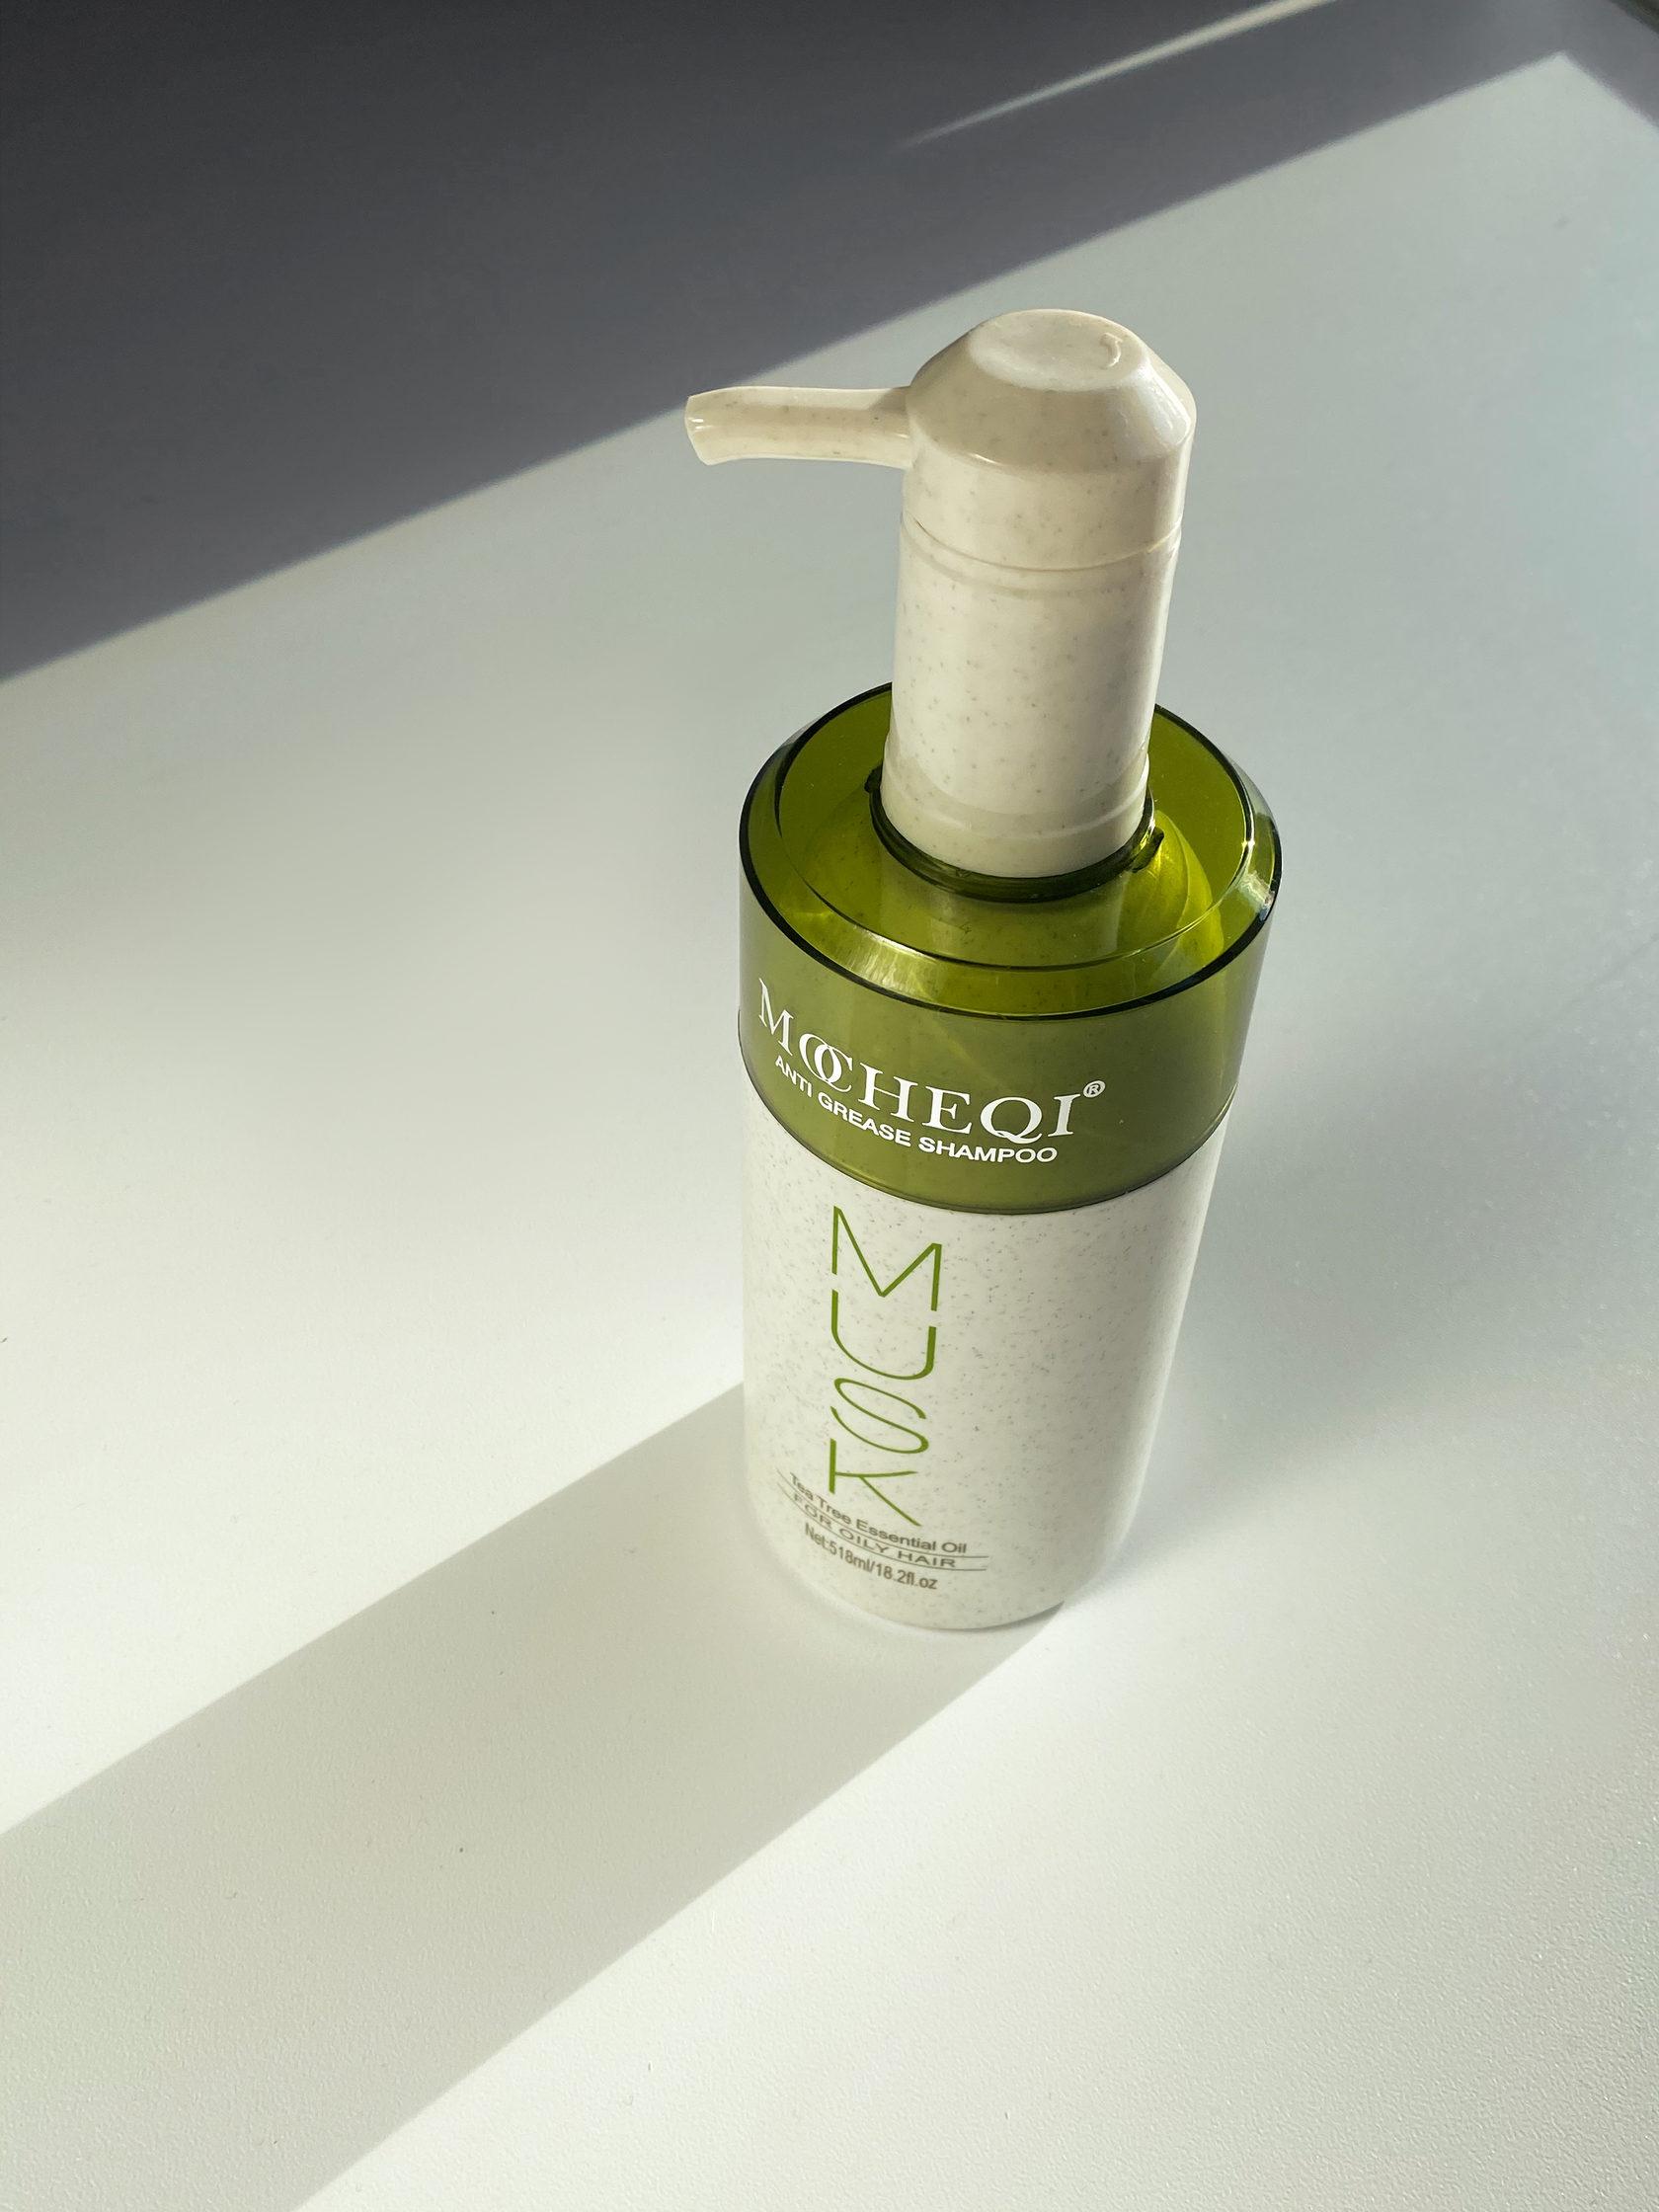 ANTI GREASE SHAMPOO - MOCHEQI MUSK